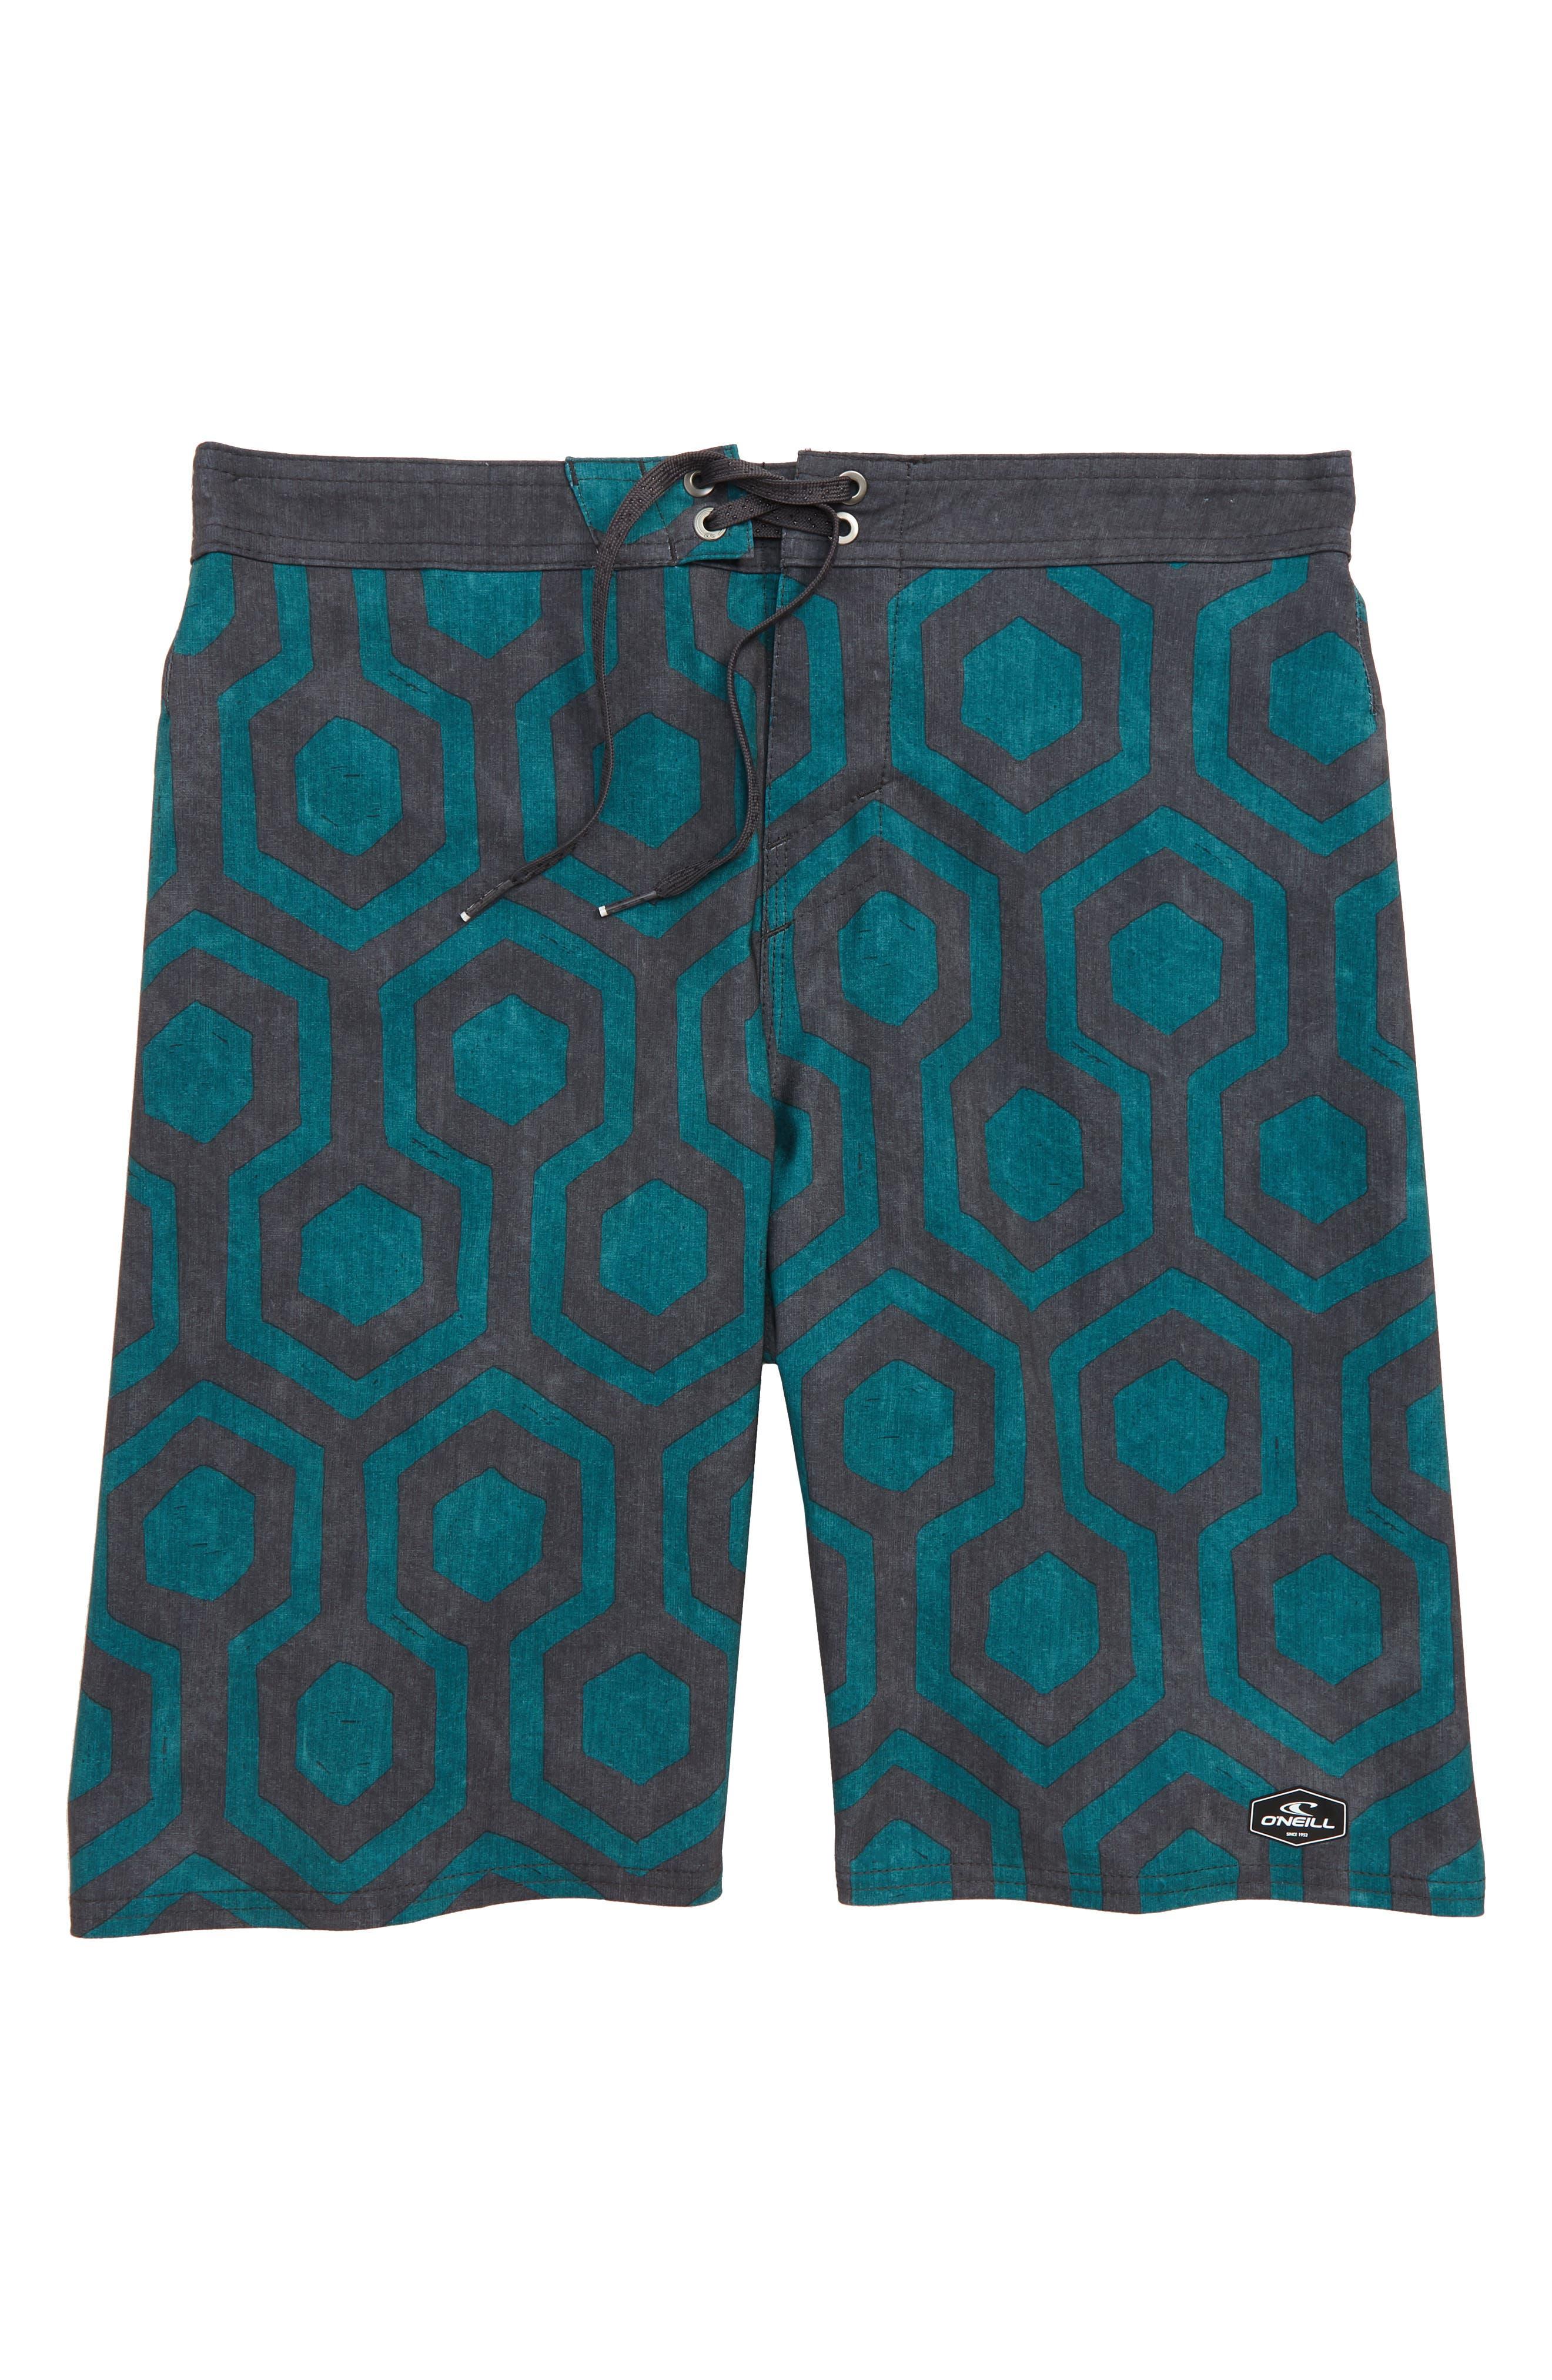 Hyperfreak Wrenched Board Shorts,                             Main thumbnail 1, color,                             Asphalt